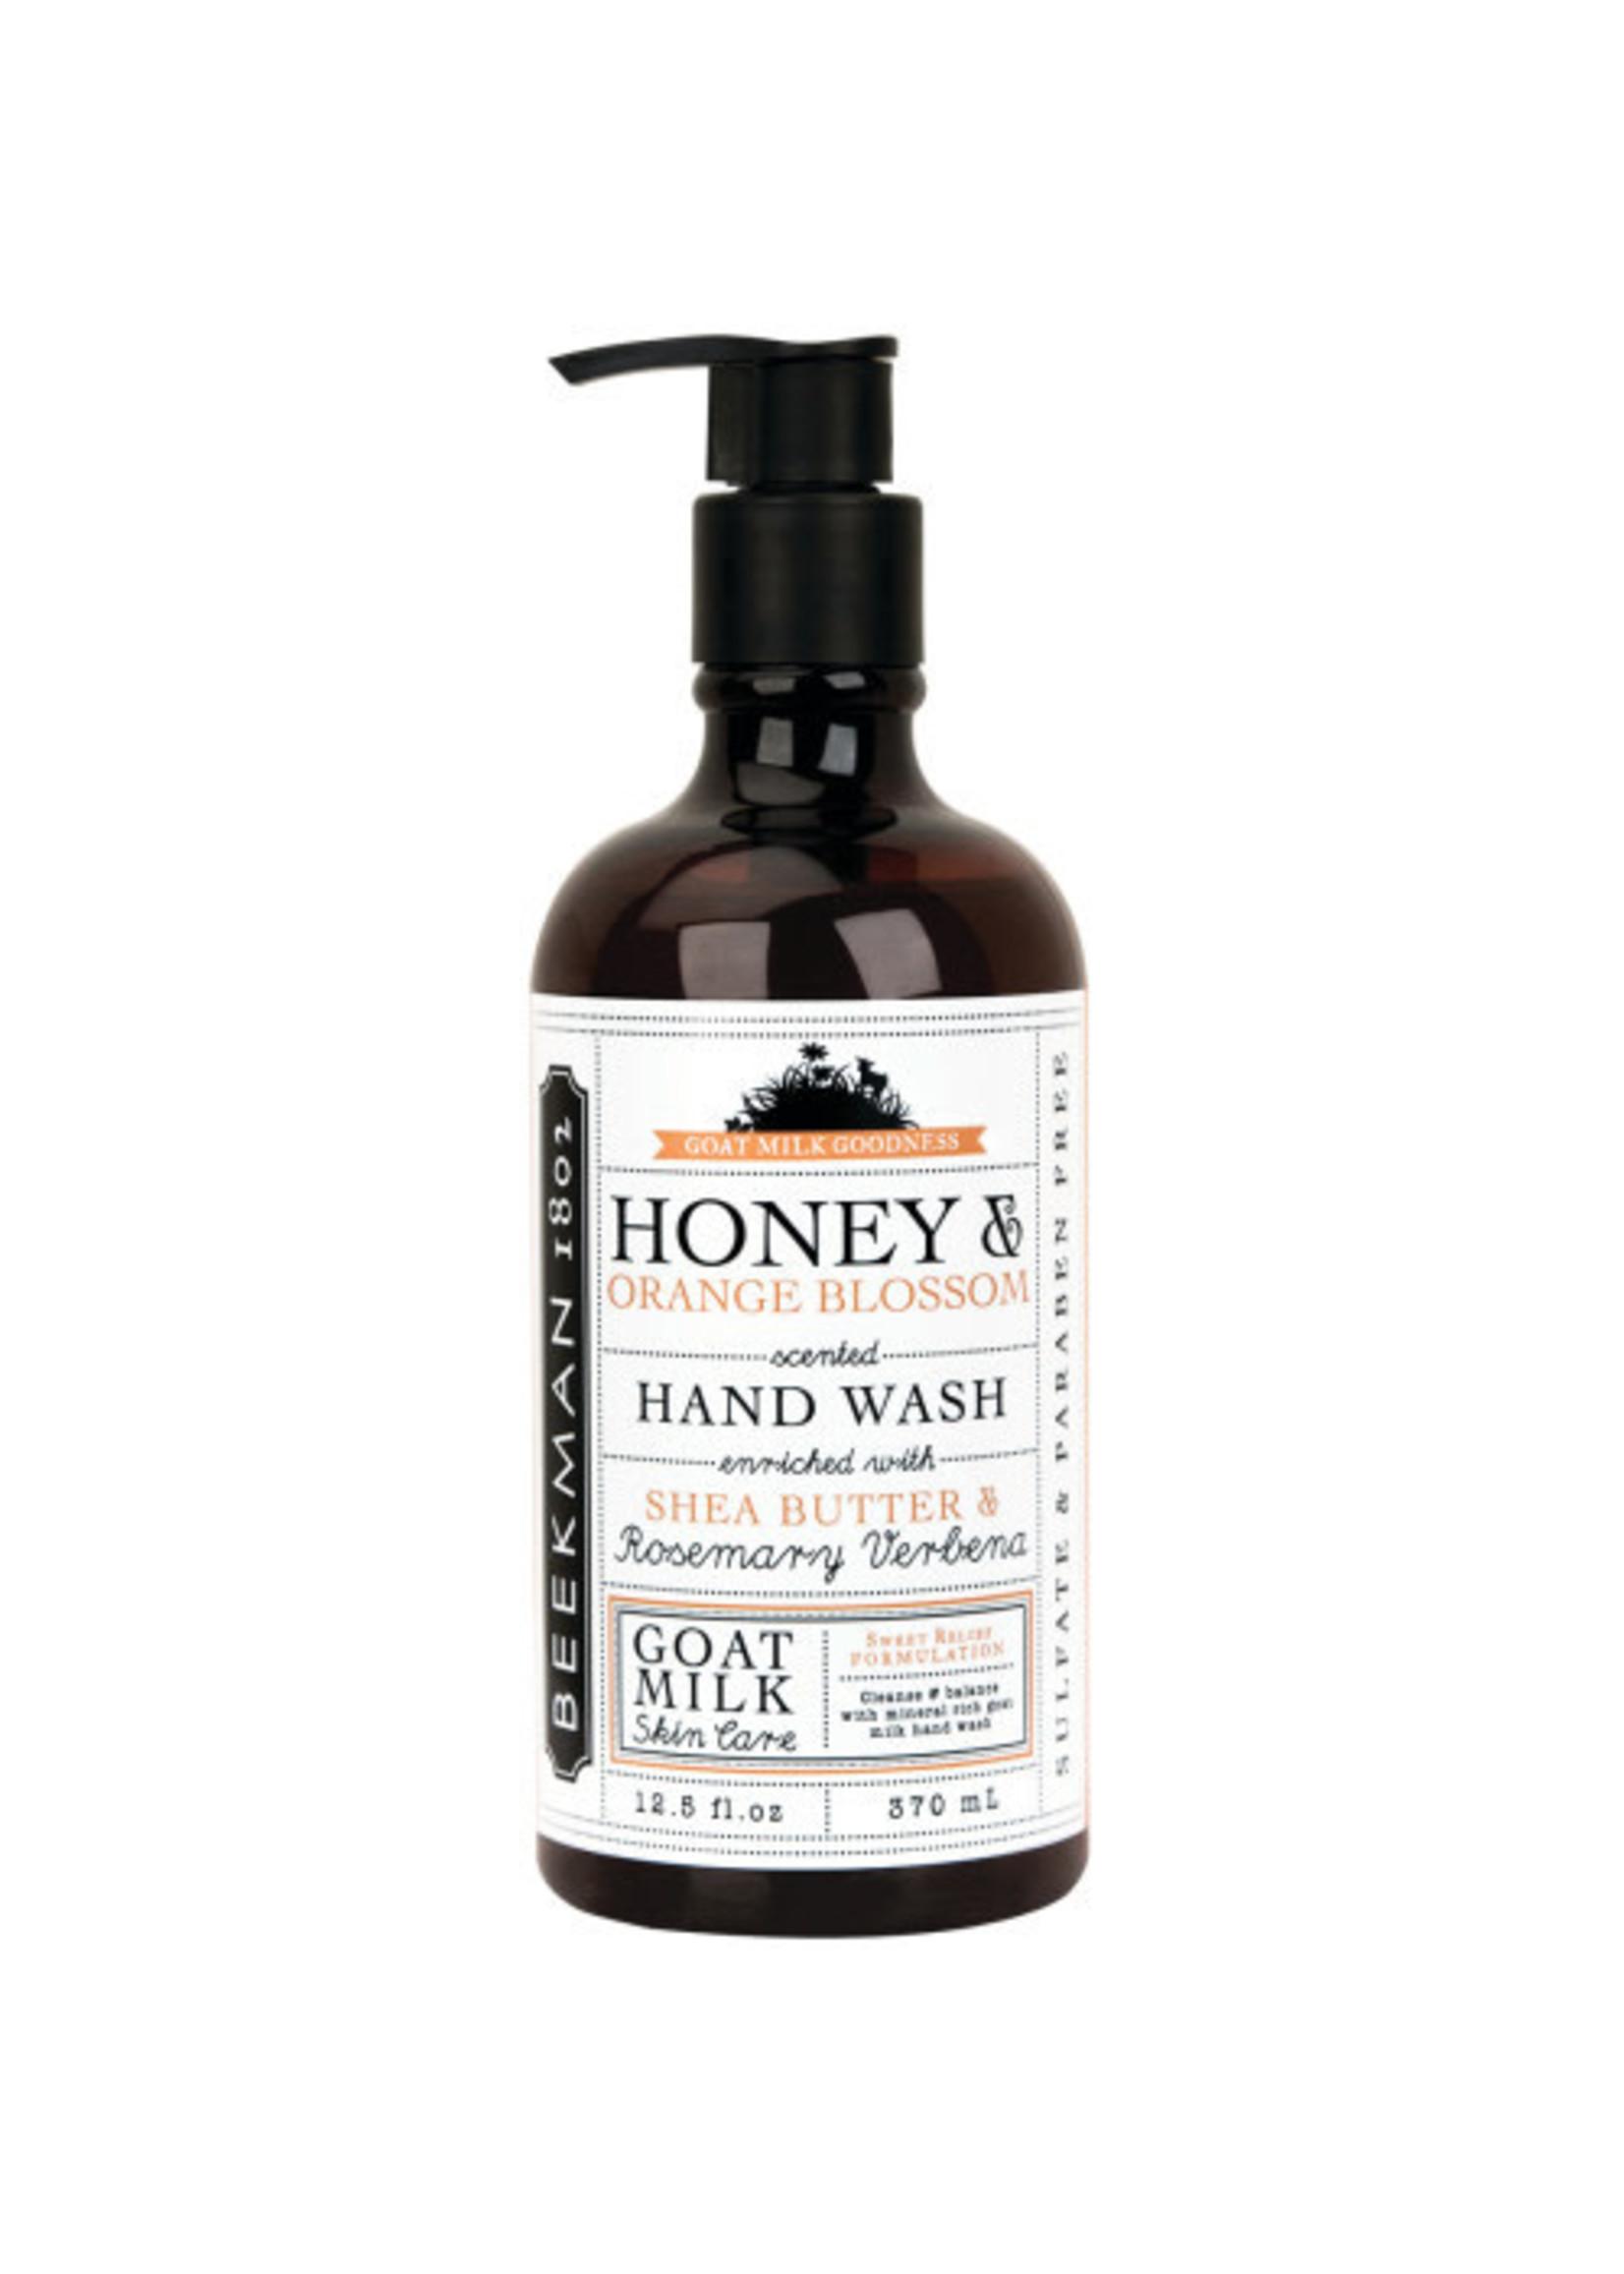 Beekman 1802 Honey & Orange Blossom Hand & Body Wash